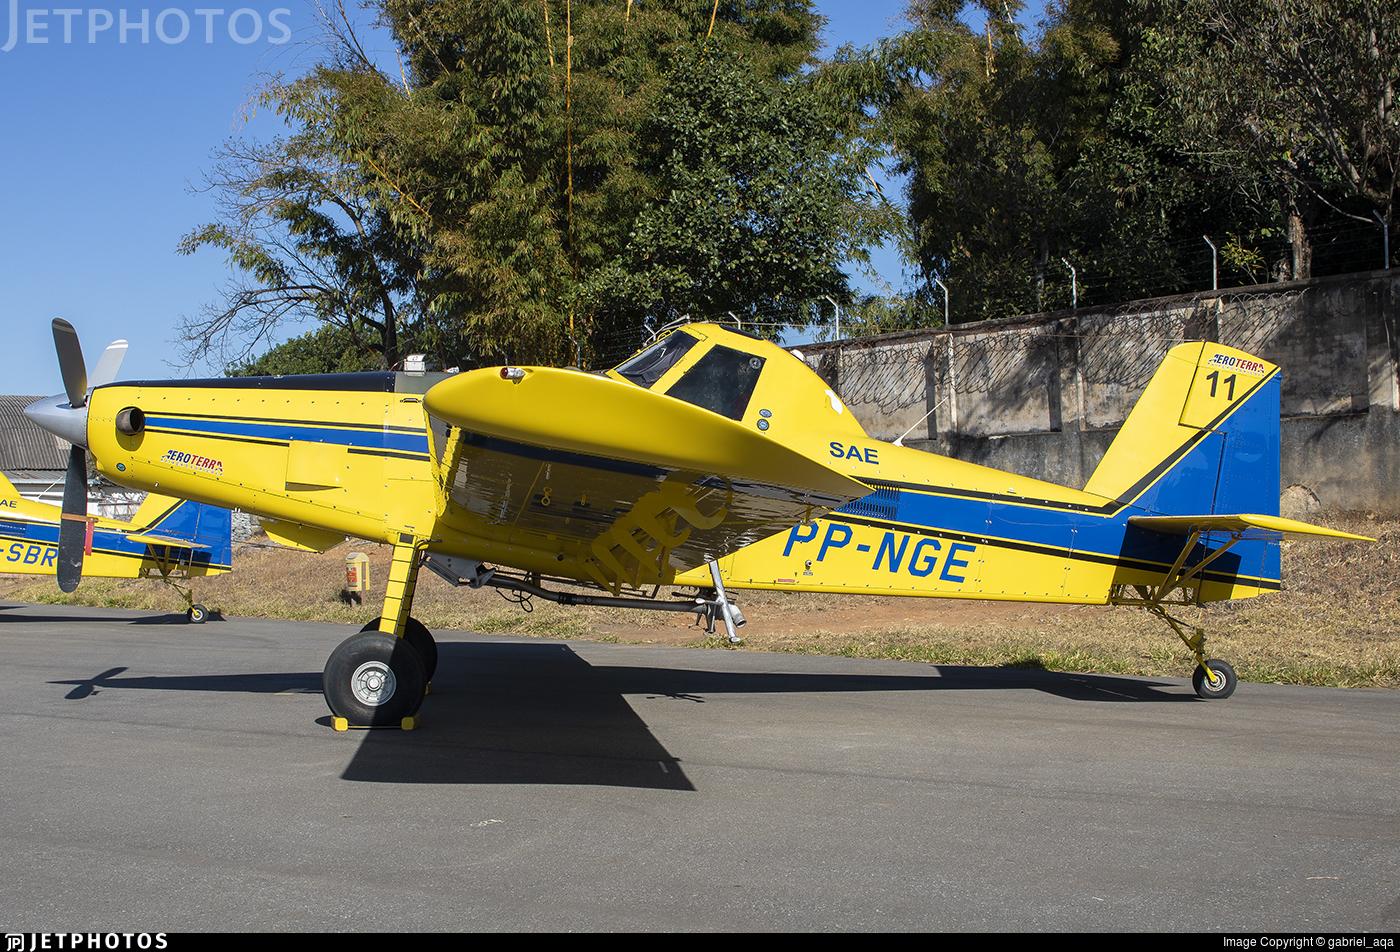 PP-NGE - Air Tractor AT-502B - Aeroterra Aviação Agrícola